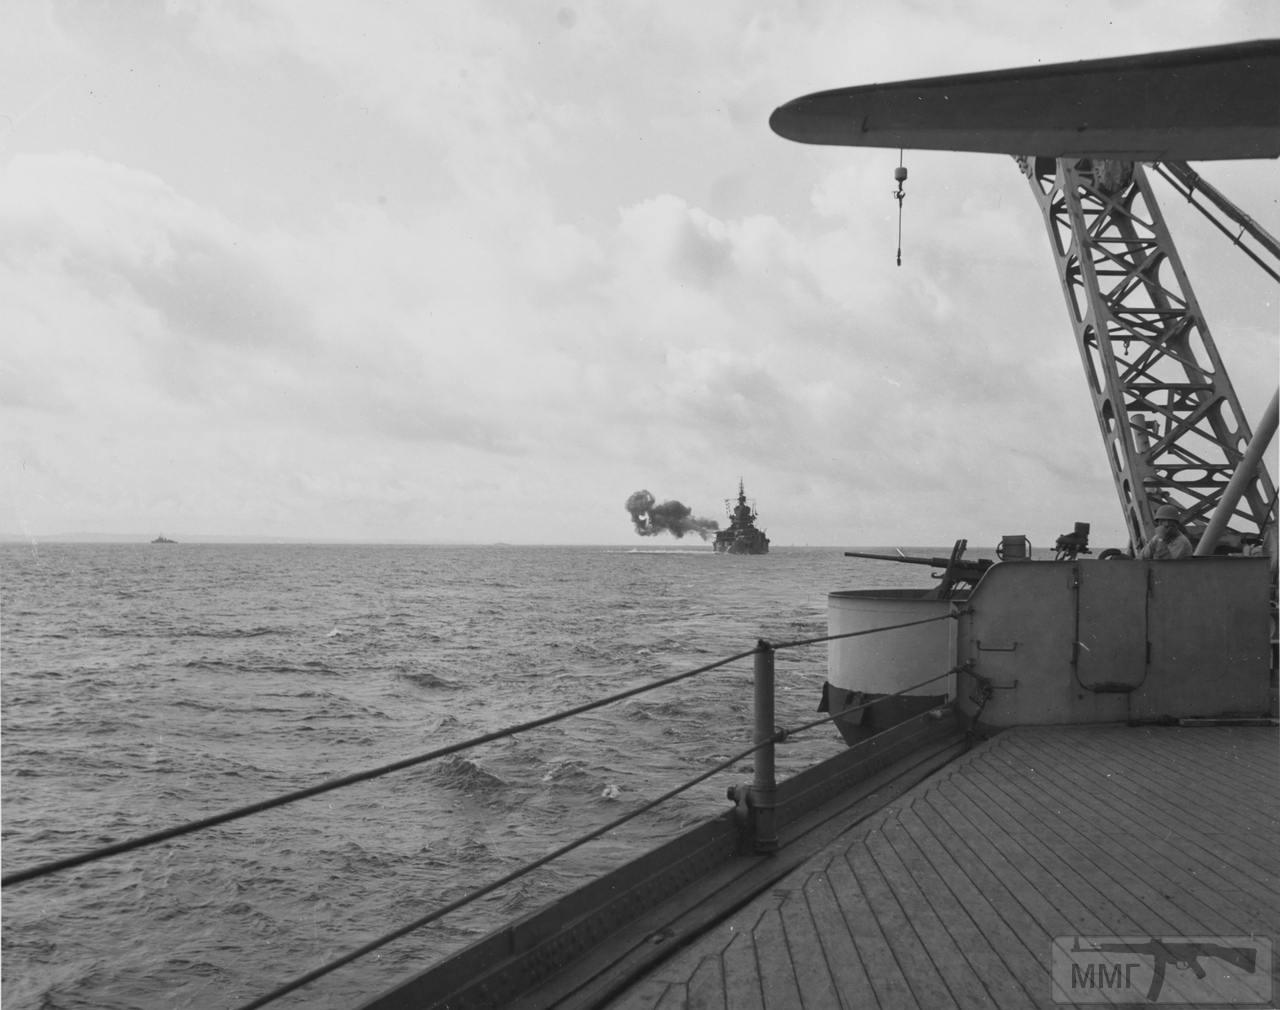 35265 - USS Idaho (BB-42) ведет огонь по Окинаве, 28 марта 1945 г., фото с борта USS West Virginia (BB-48)